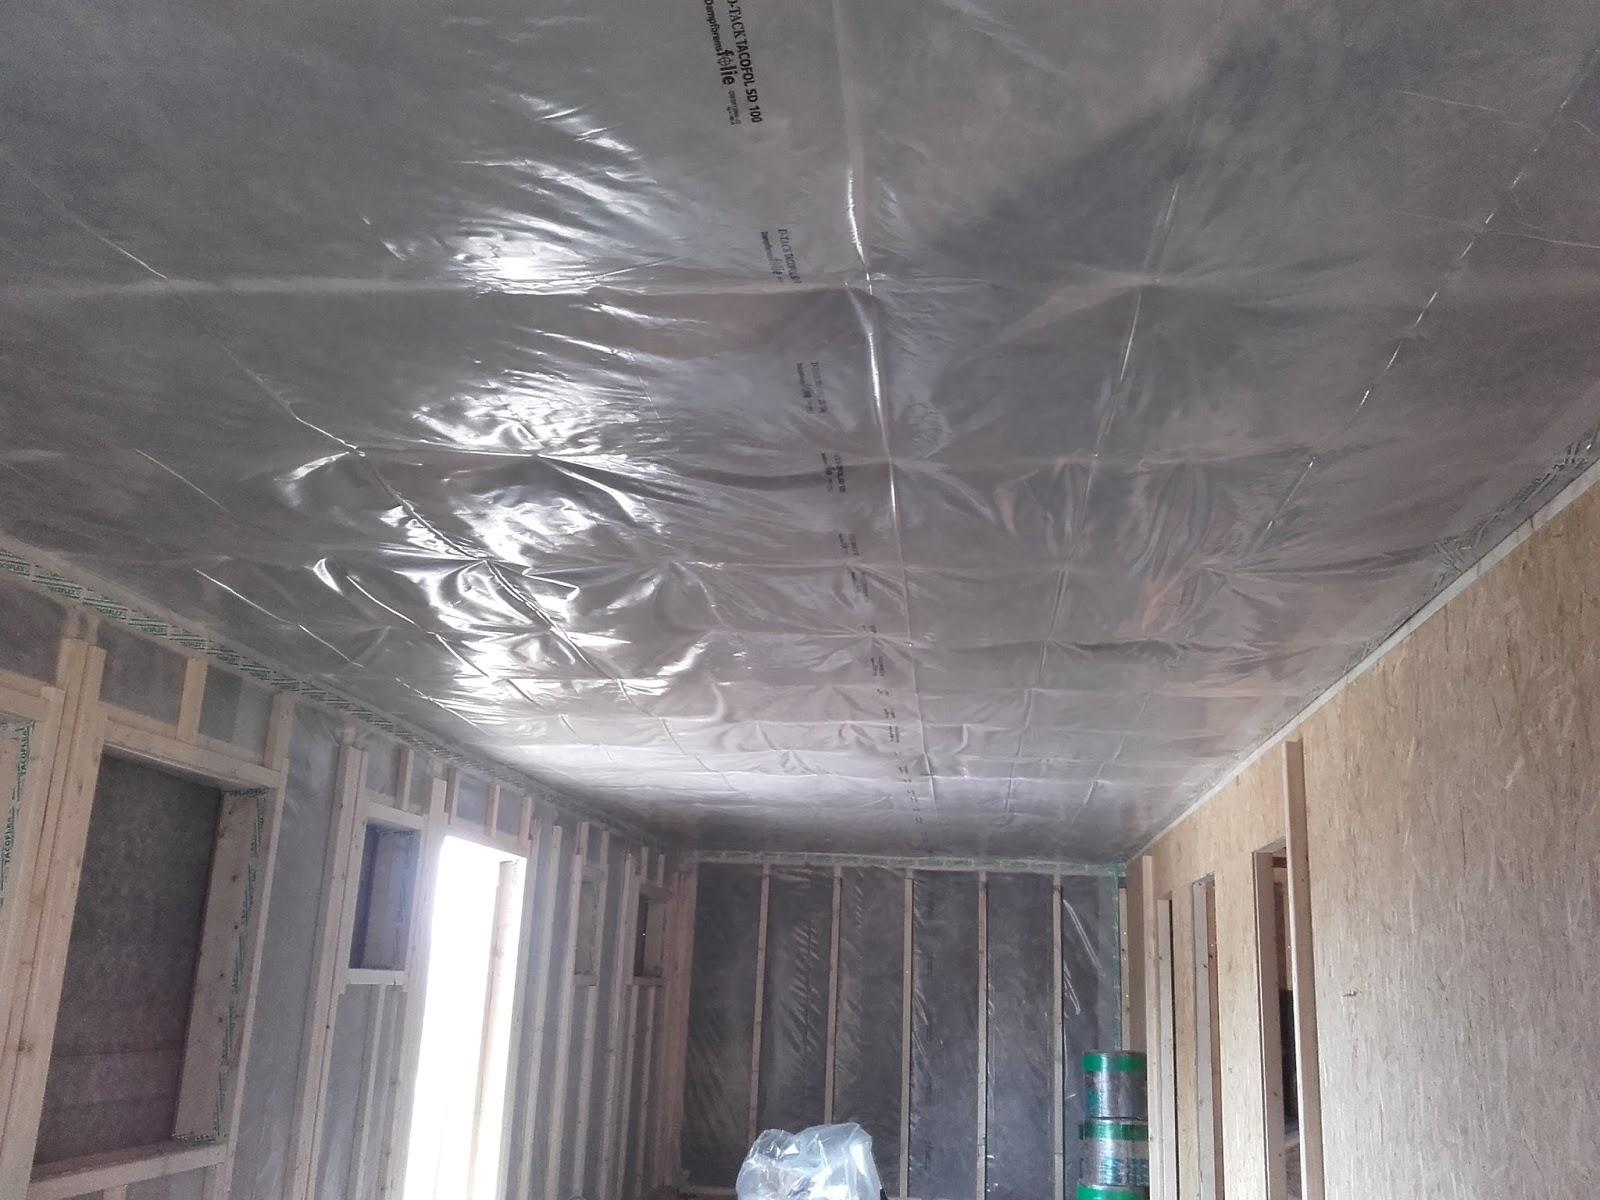 Dampfsperre Badezimmer Decke Decke Isolieren Kellerdecke D Mmen